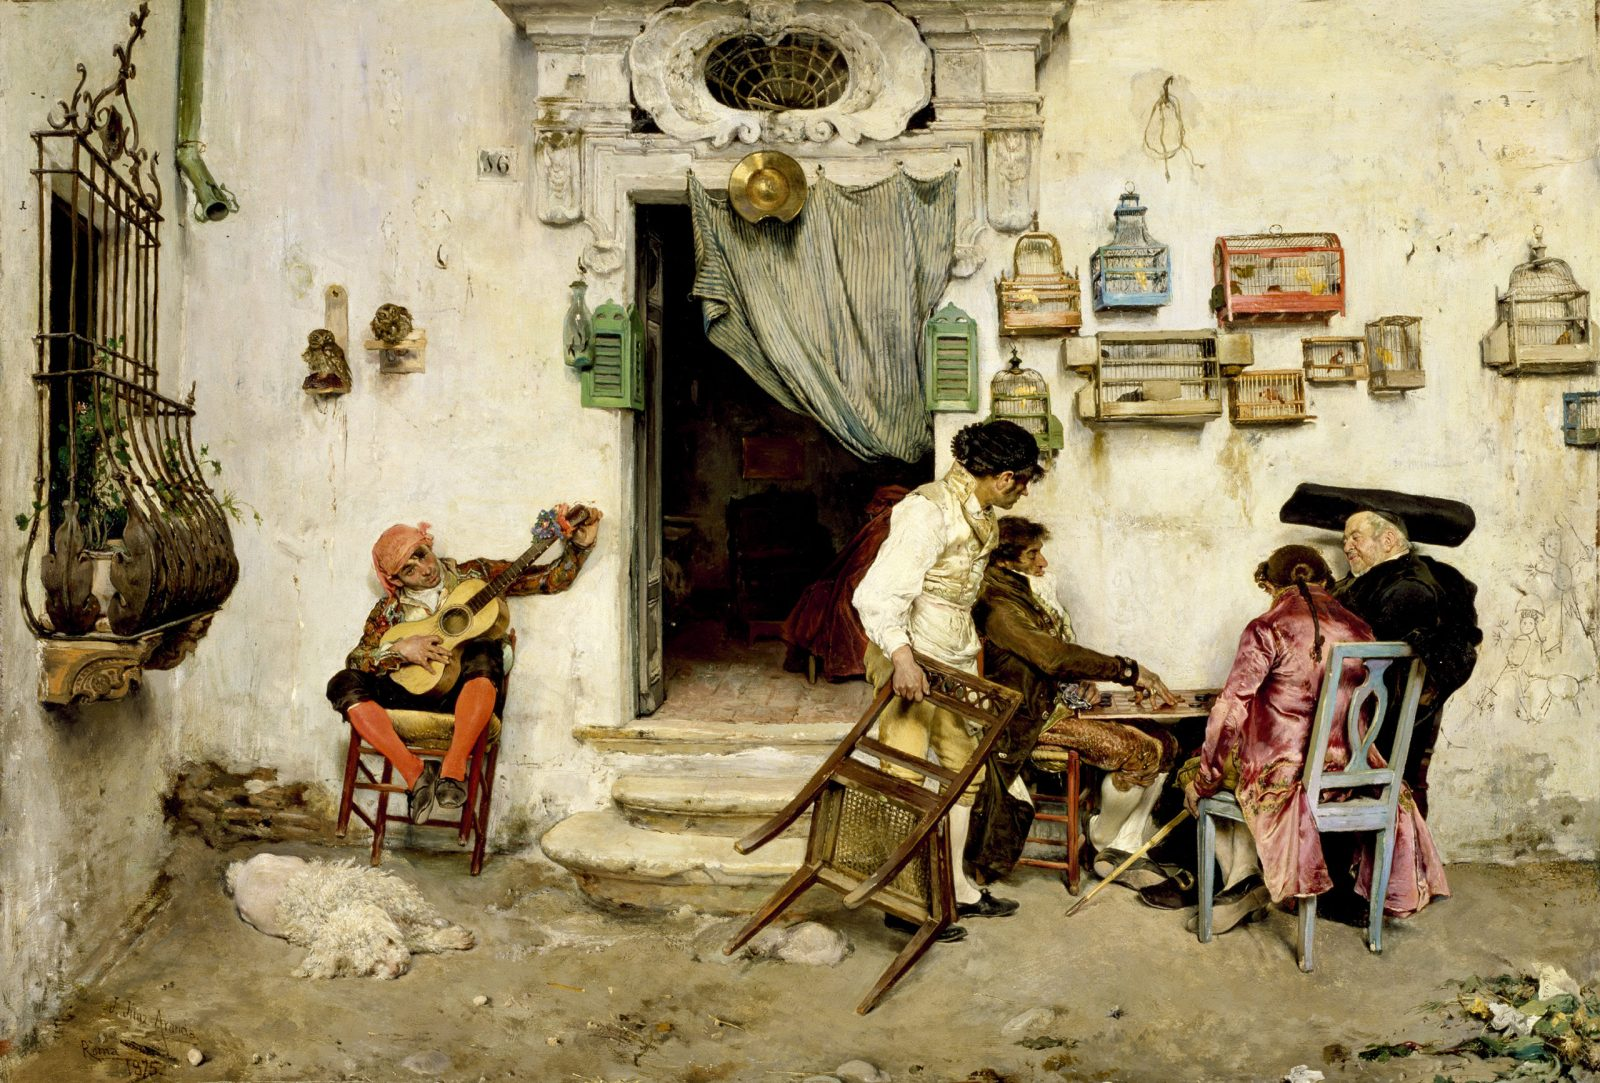 José Jiménez Aranda (Spanish, 1837–1903) Figaro's Shop, 1875 Oil on canvas Walters Art Museum, acquired by William T. Walters before 1878.